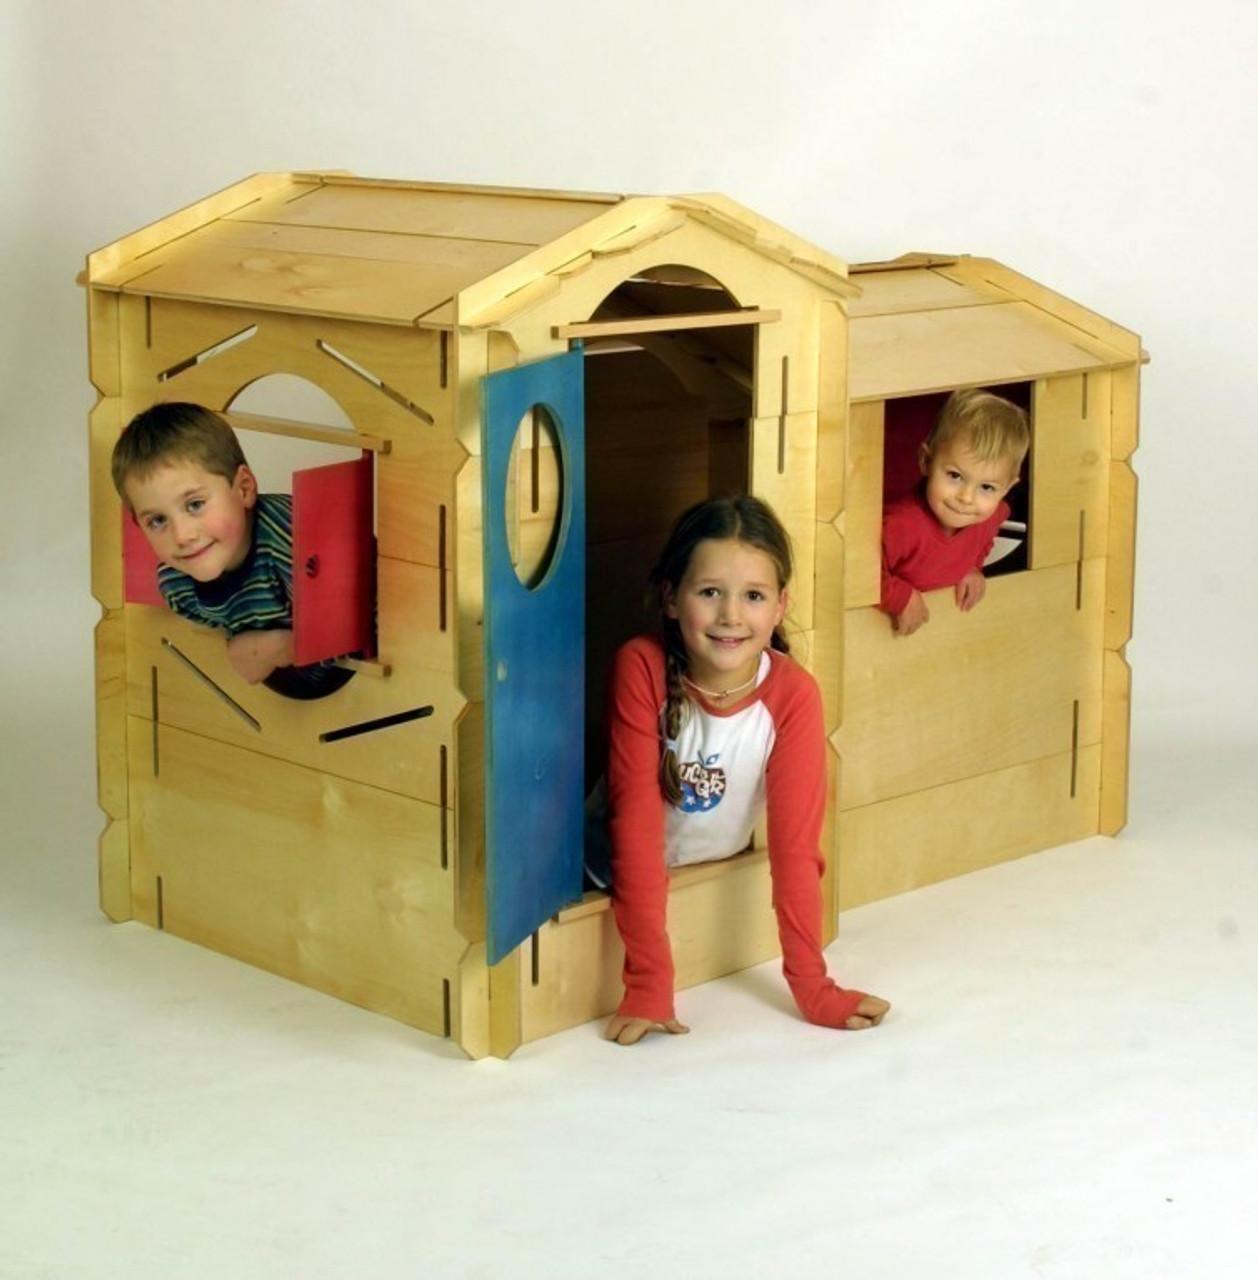 bauka erweiterungs set anbau 2 zimmer kinderm bel. Black Bedroom Furniture Sets. Home Design Ideas